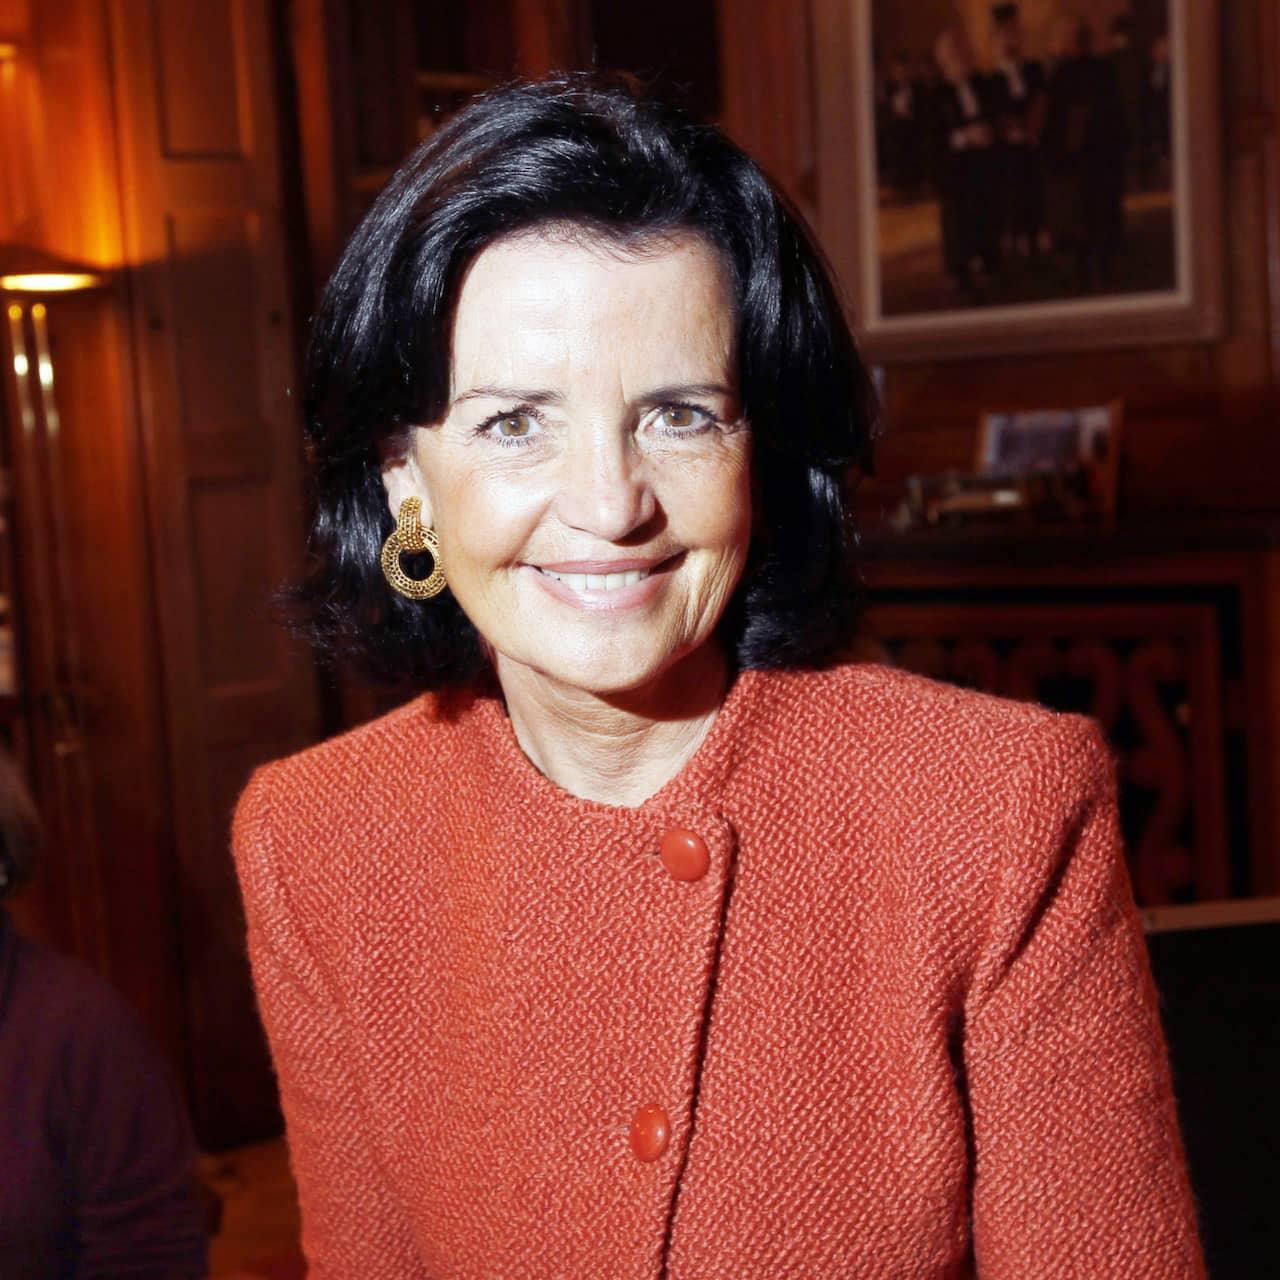 16. Anne Ramberg